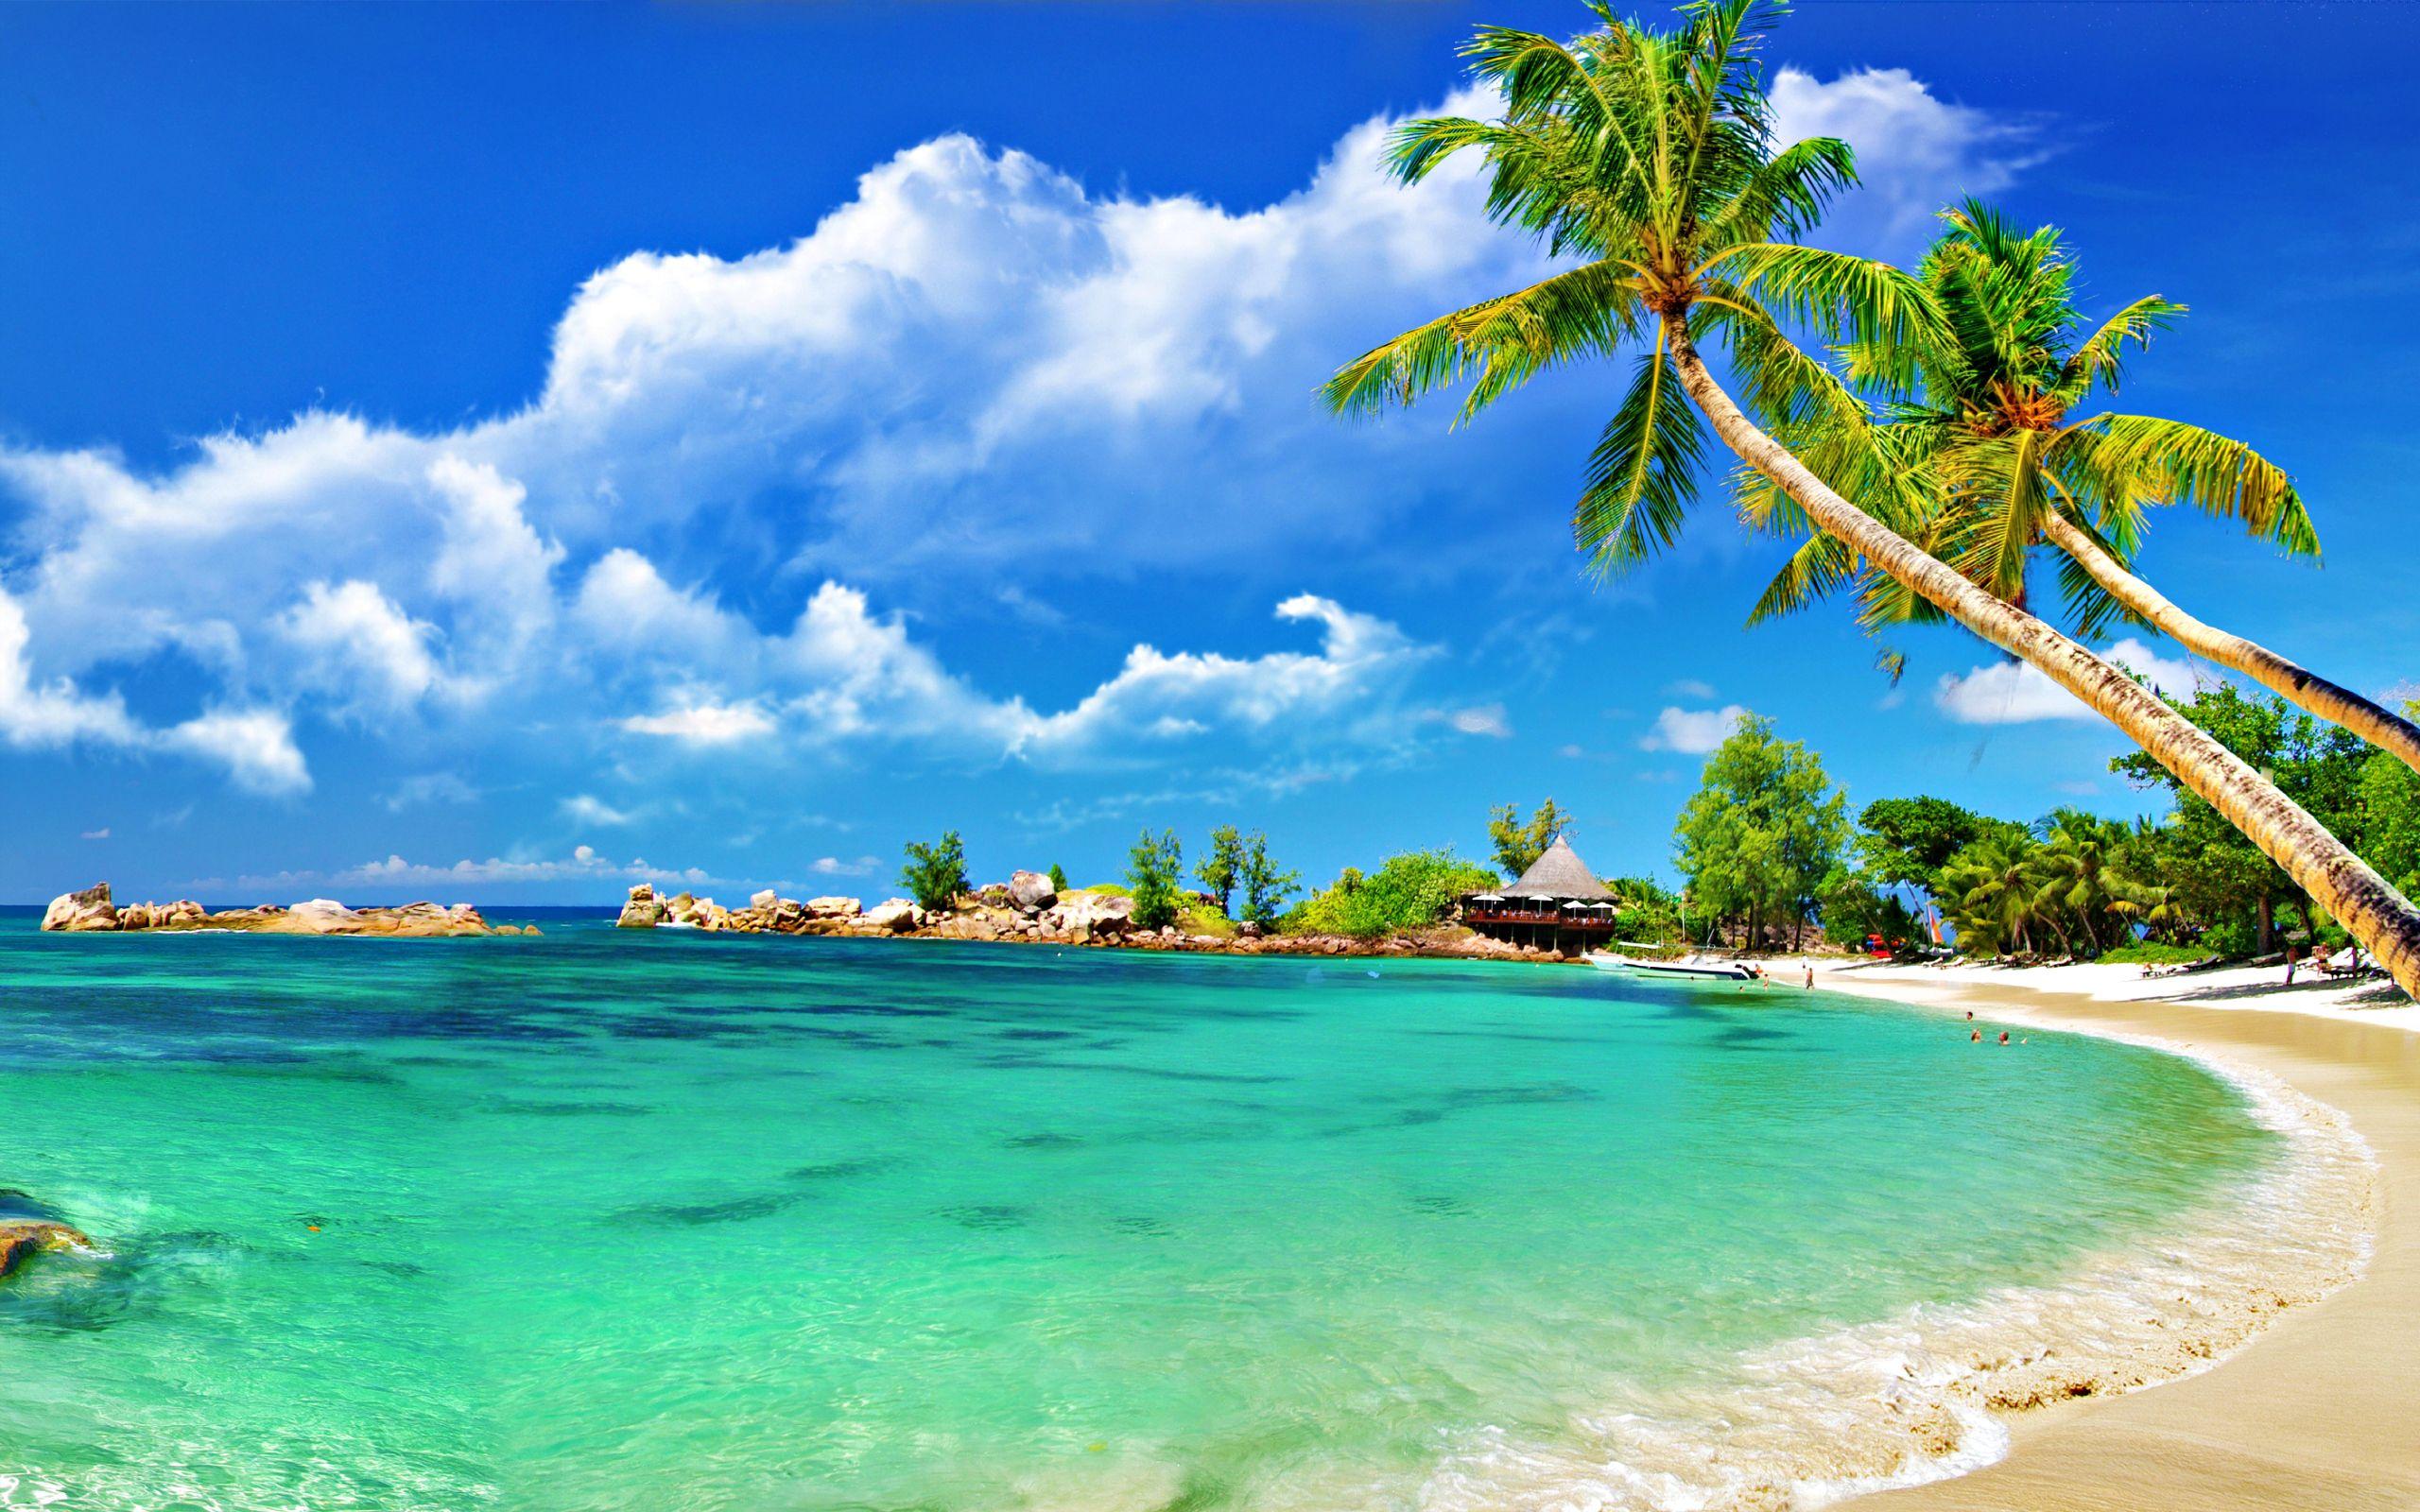 Calmhub Beach Wallpaper Beach Background Andaman And Nicobar Islands